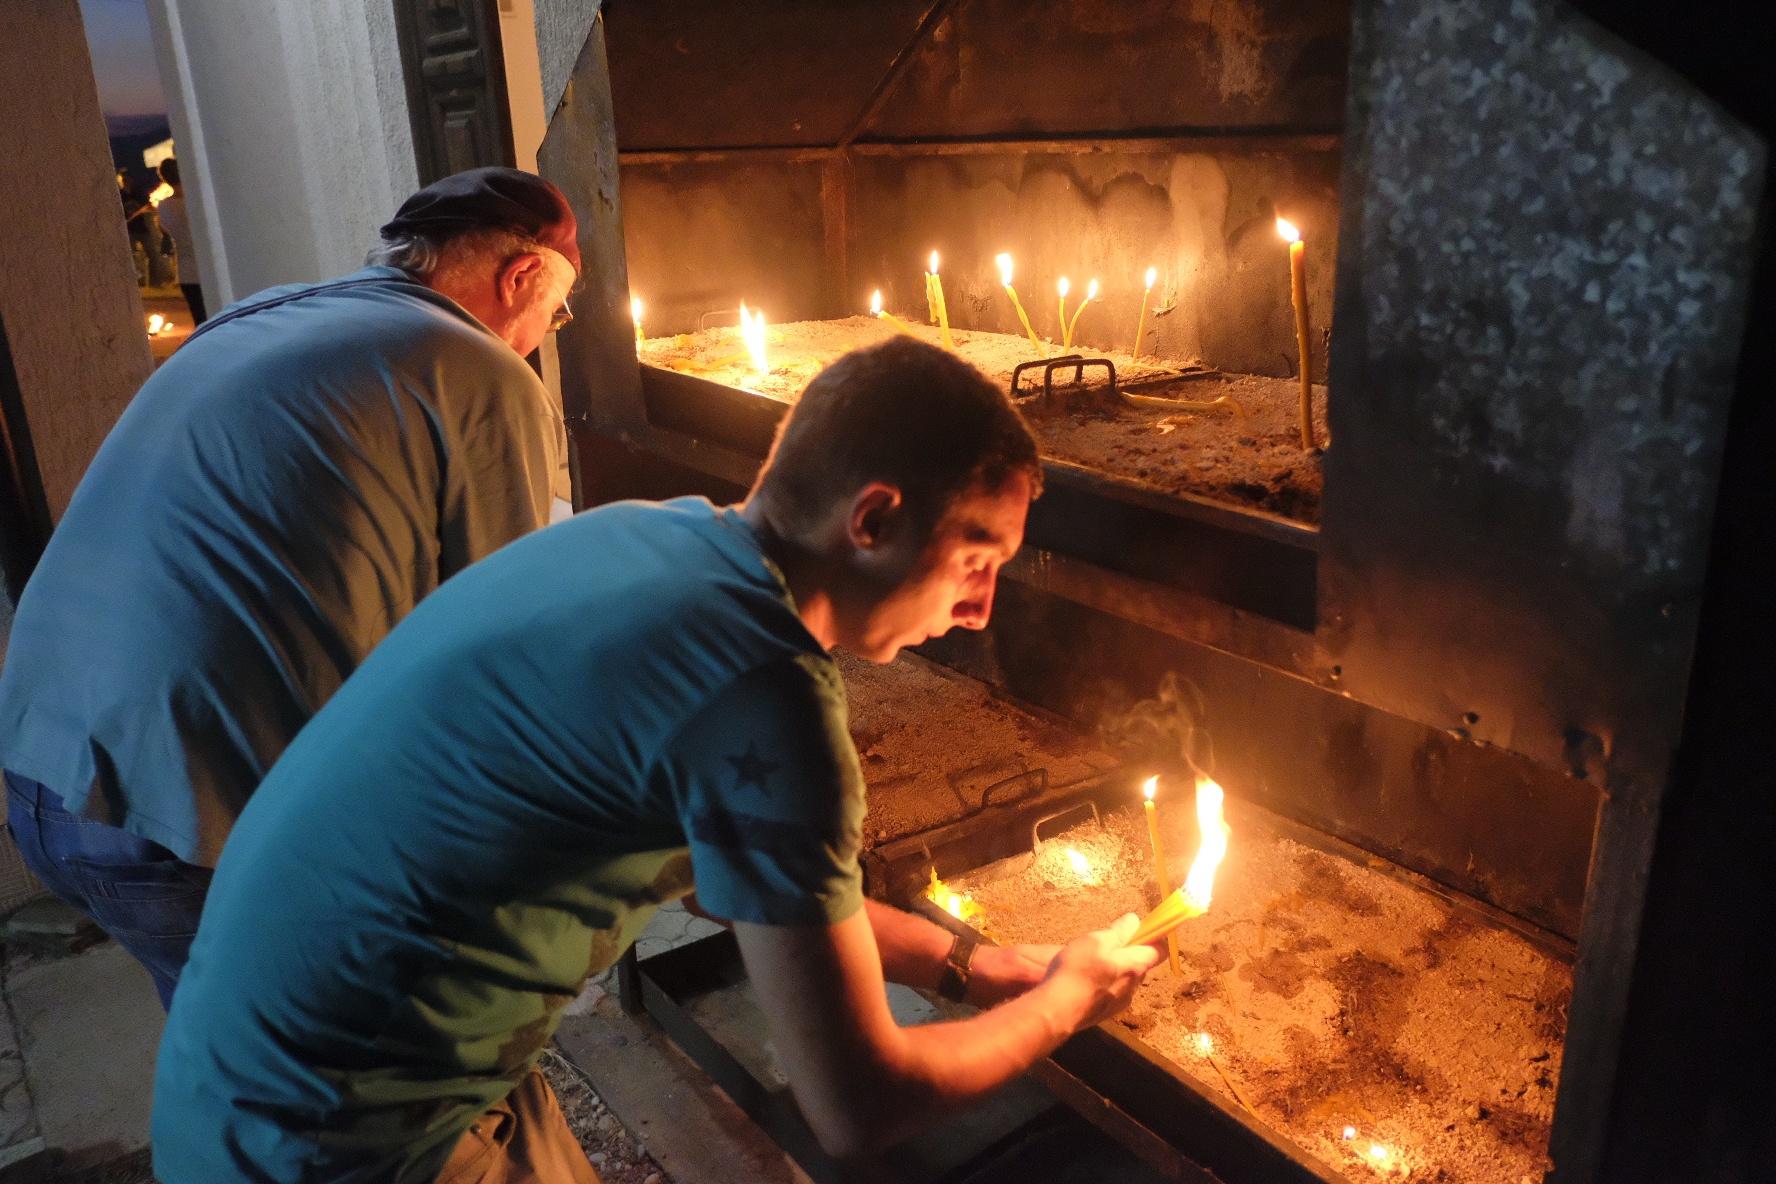 Ortodox Serbs light candles in the church by Goran Jorganovich